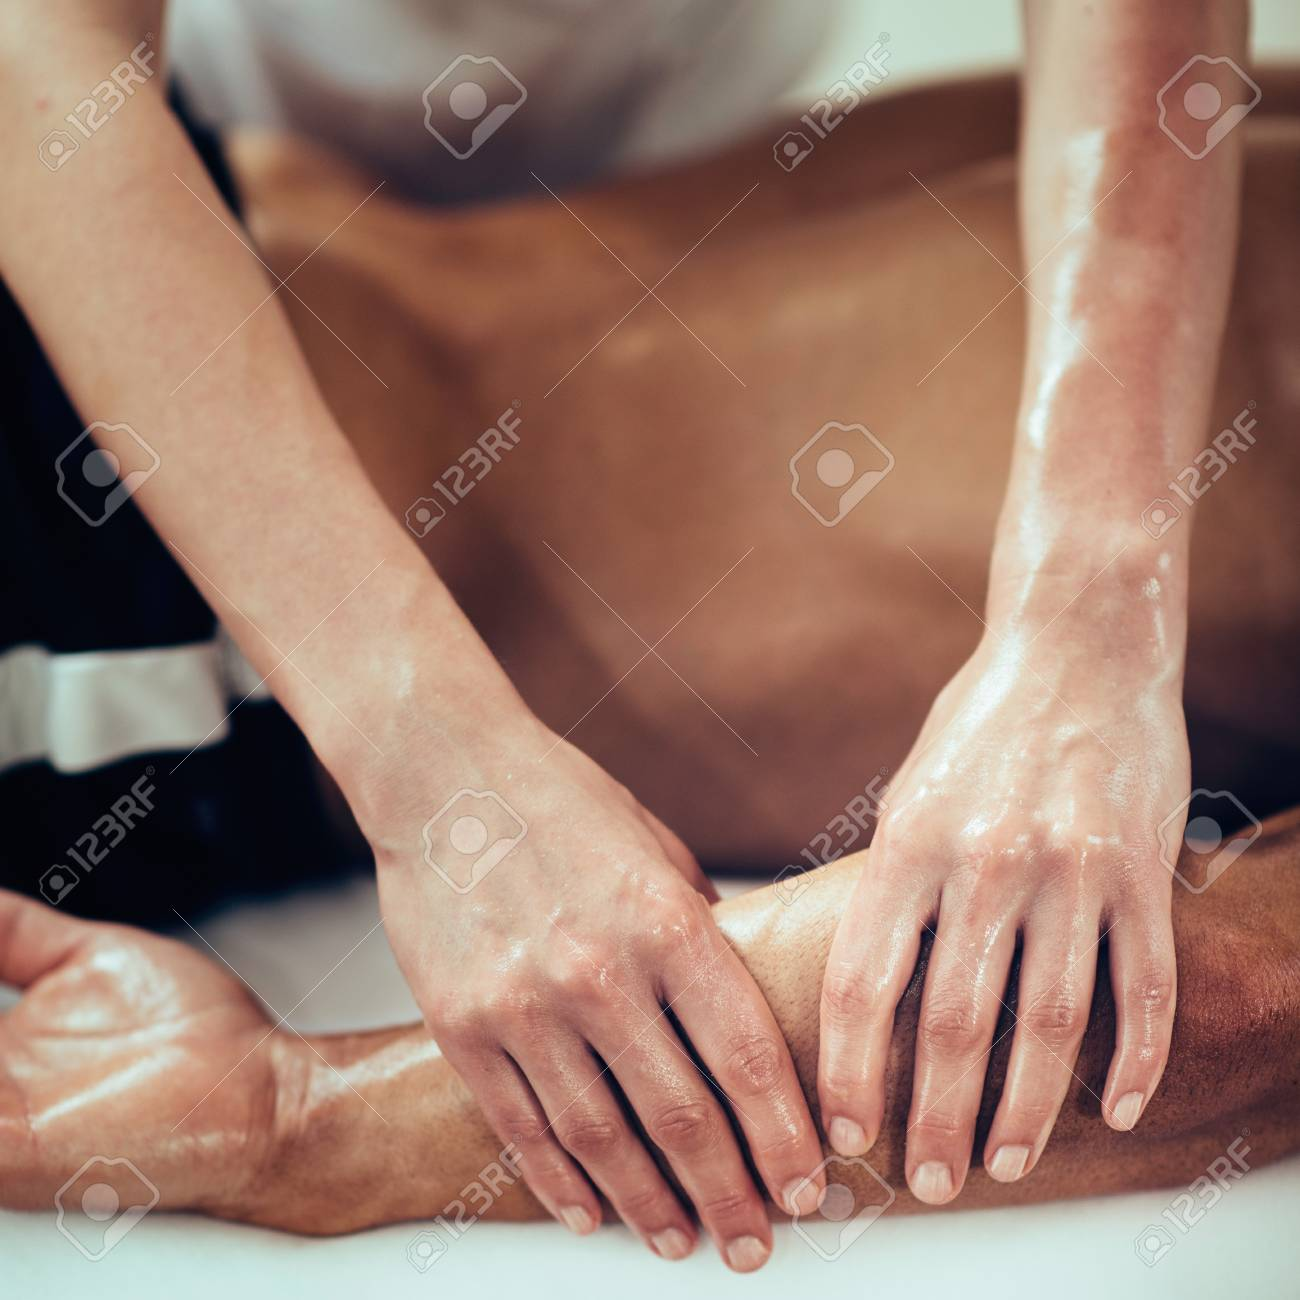 sexe pic massage WETT chatte pic